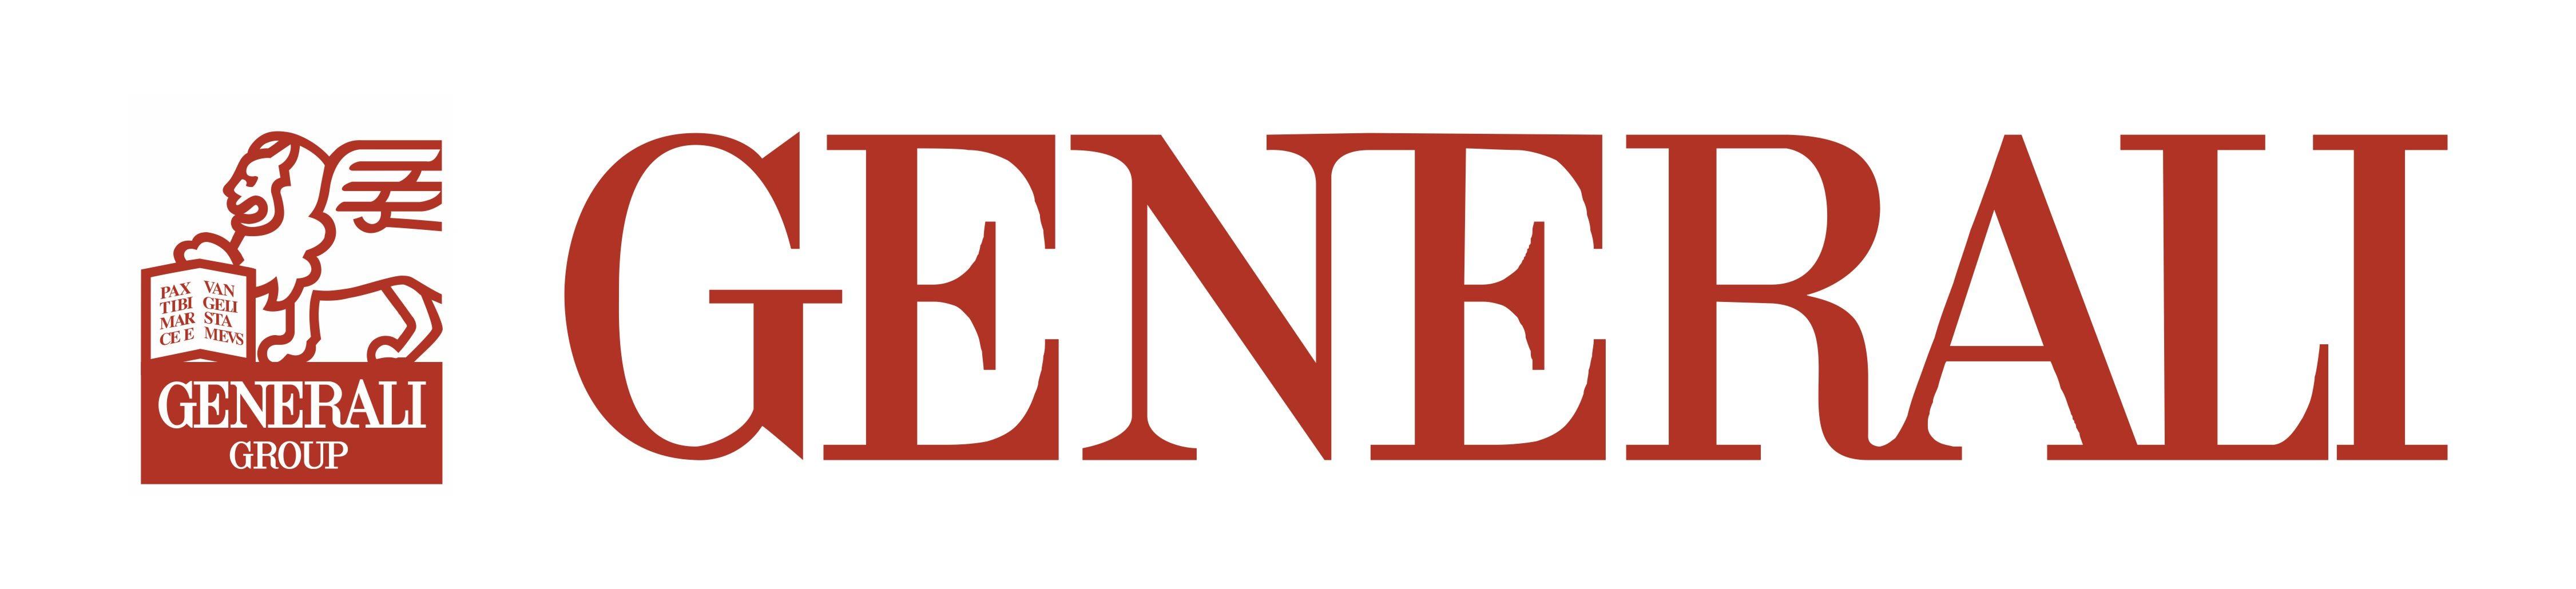 generali-logo-png-5